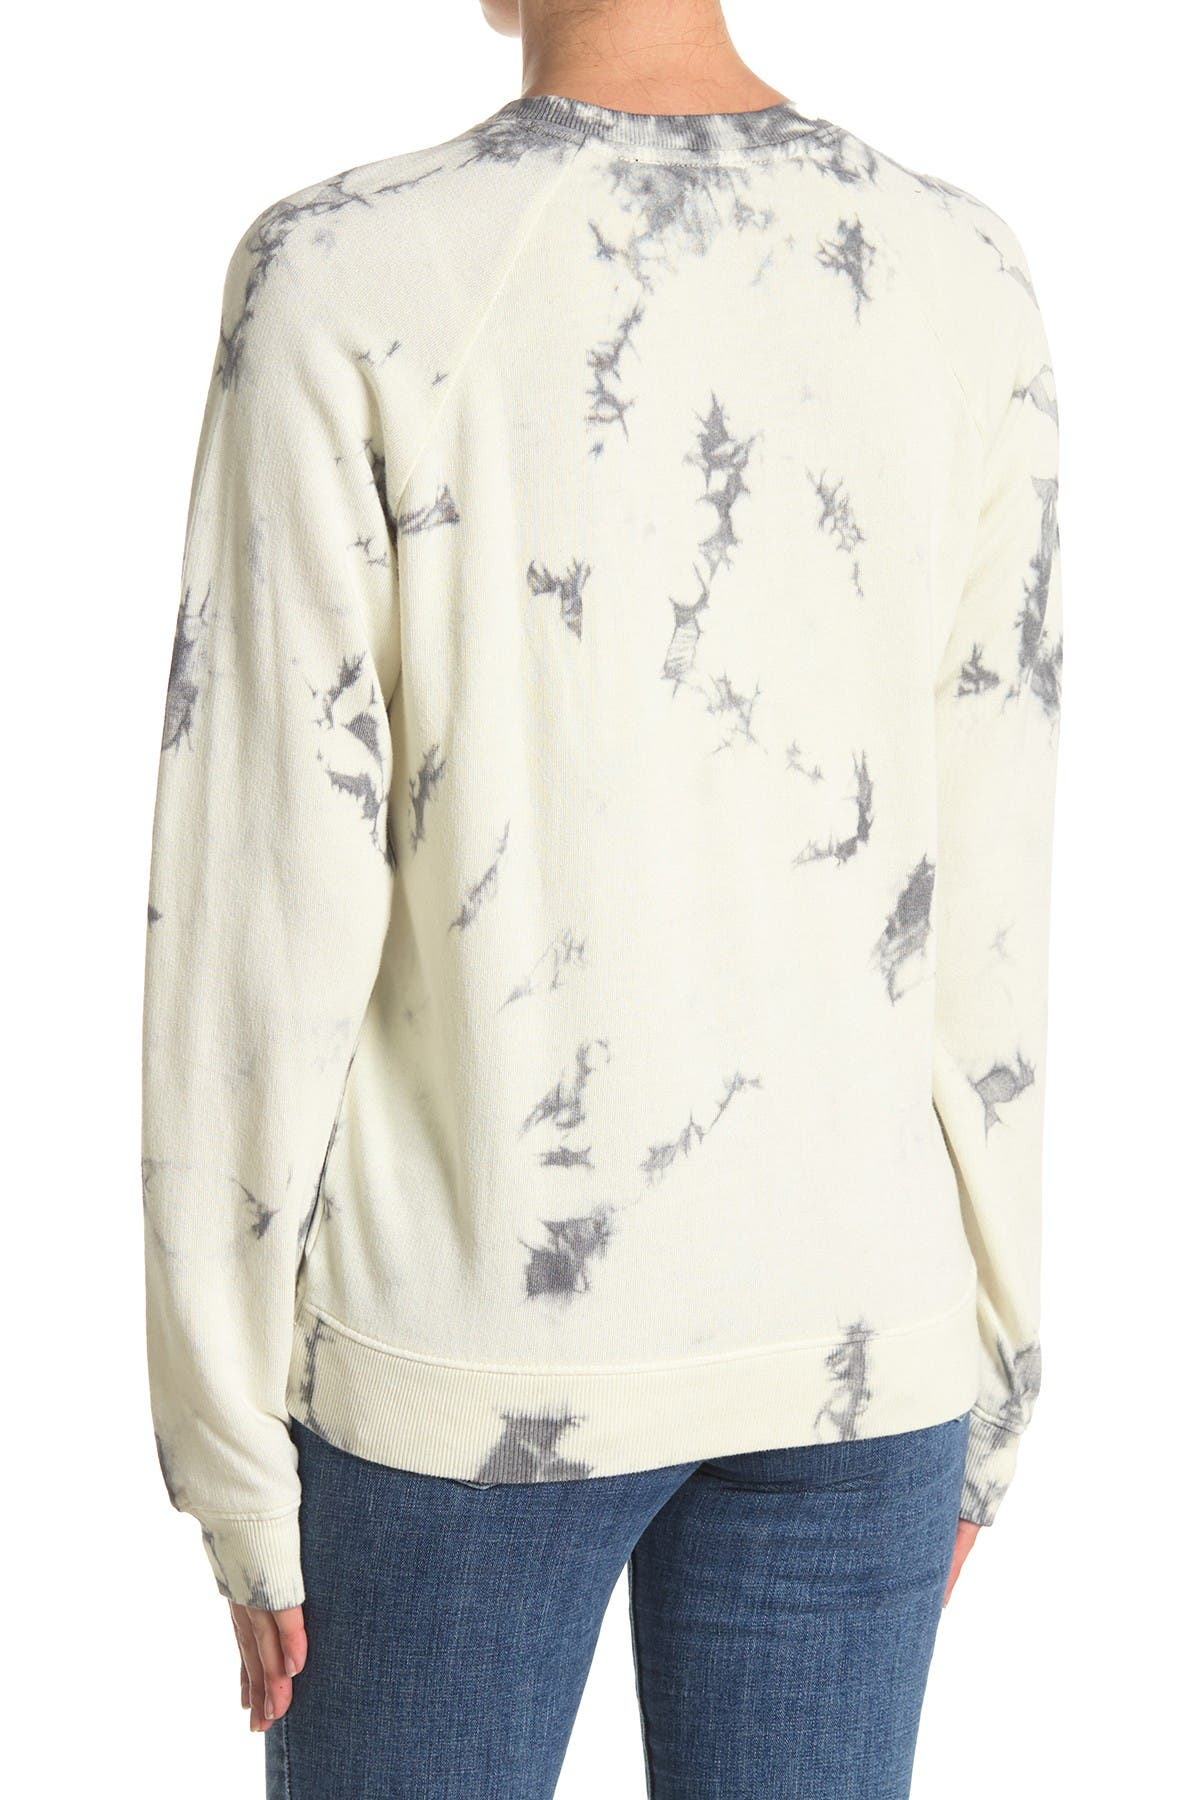 Image of Lucky Brand 'West' Tie Dye Sweatshirt